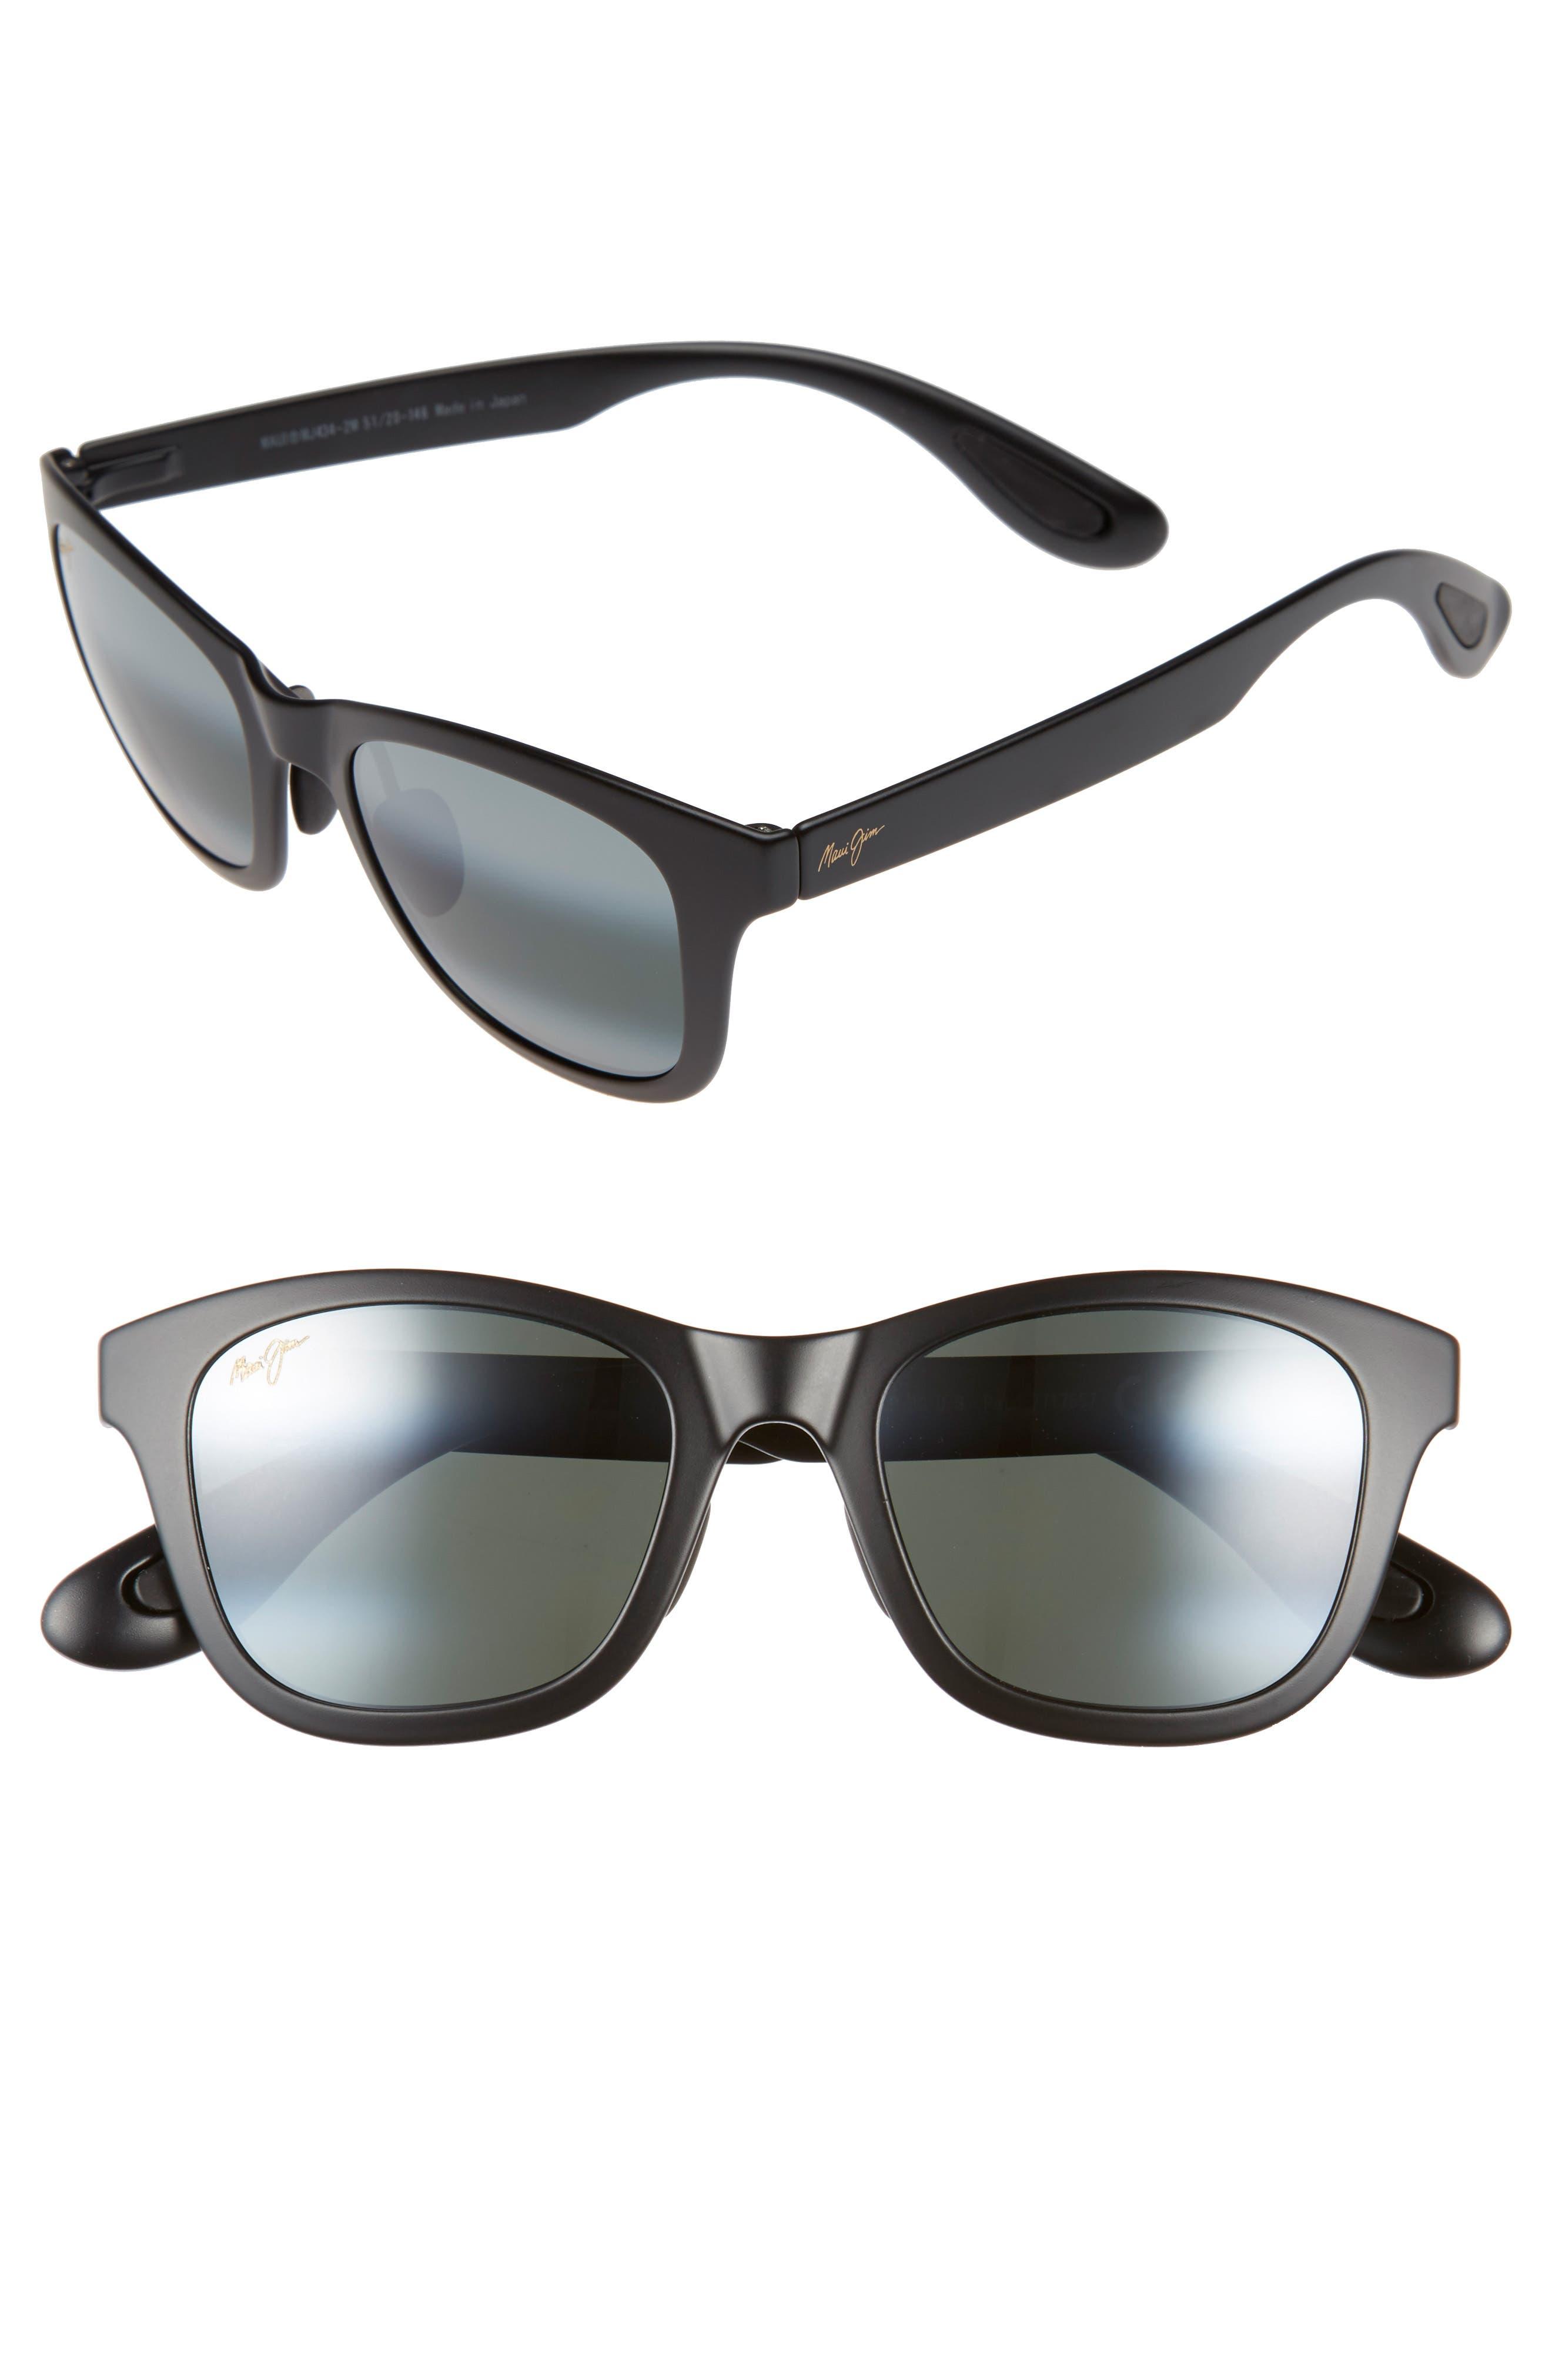 Hana Bay 51mm PolarizedPlus2<sup>®</sup> Sunglasses,                             Alternate thumbnail 3, color,                             MATTE BLACK/ NEUTRAL GREY